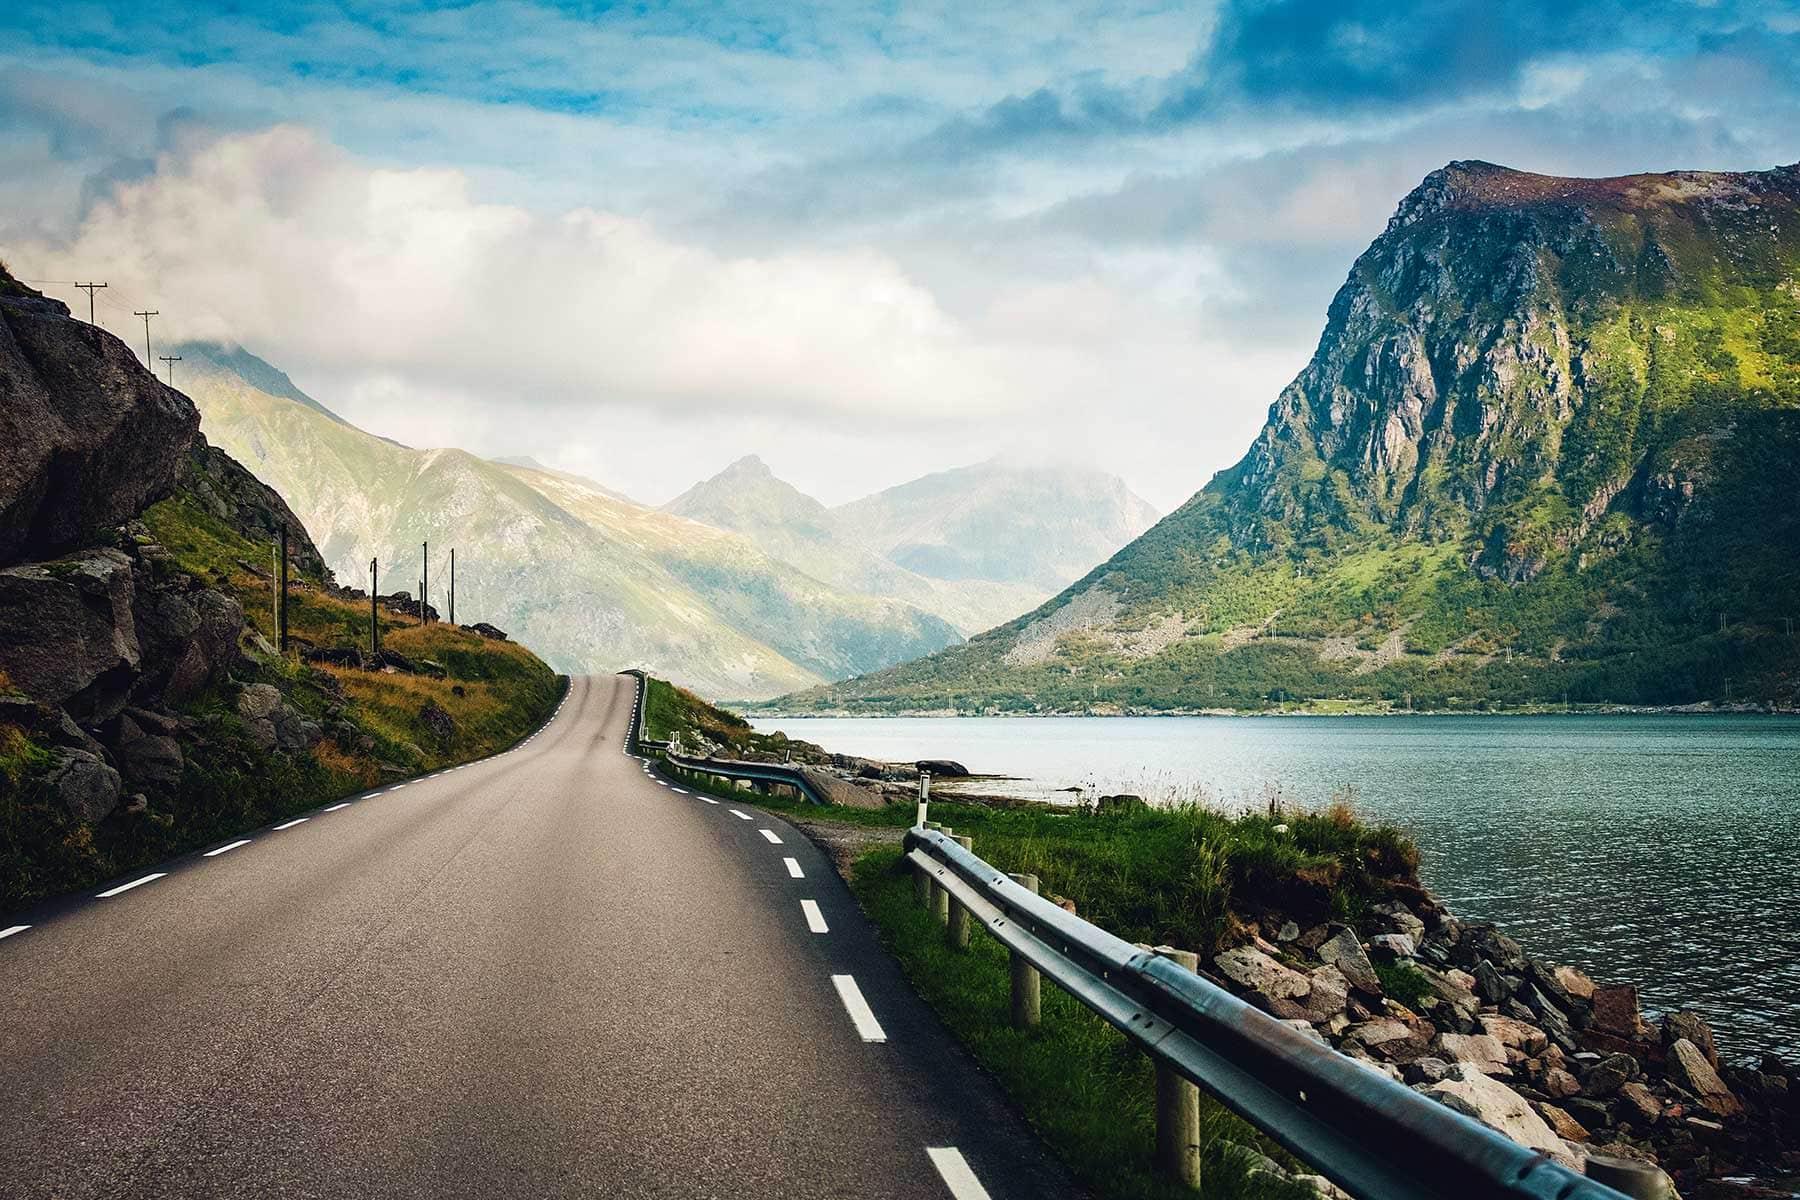 Resor-till-Lofoten-i-Norge---landskap-Nygren-Lind-Resebyrå